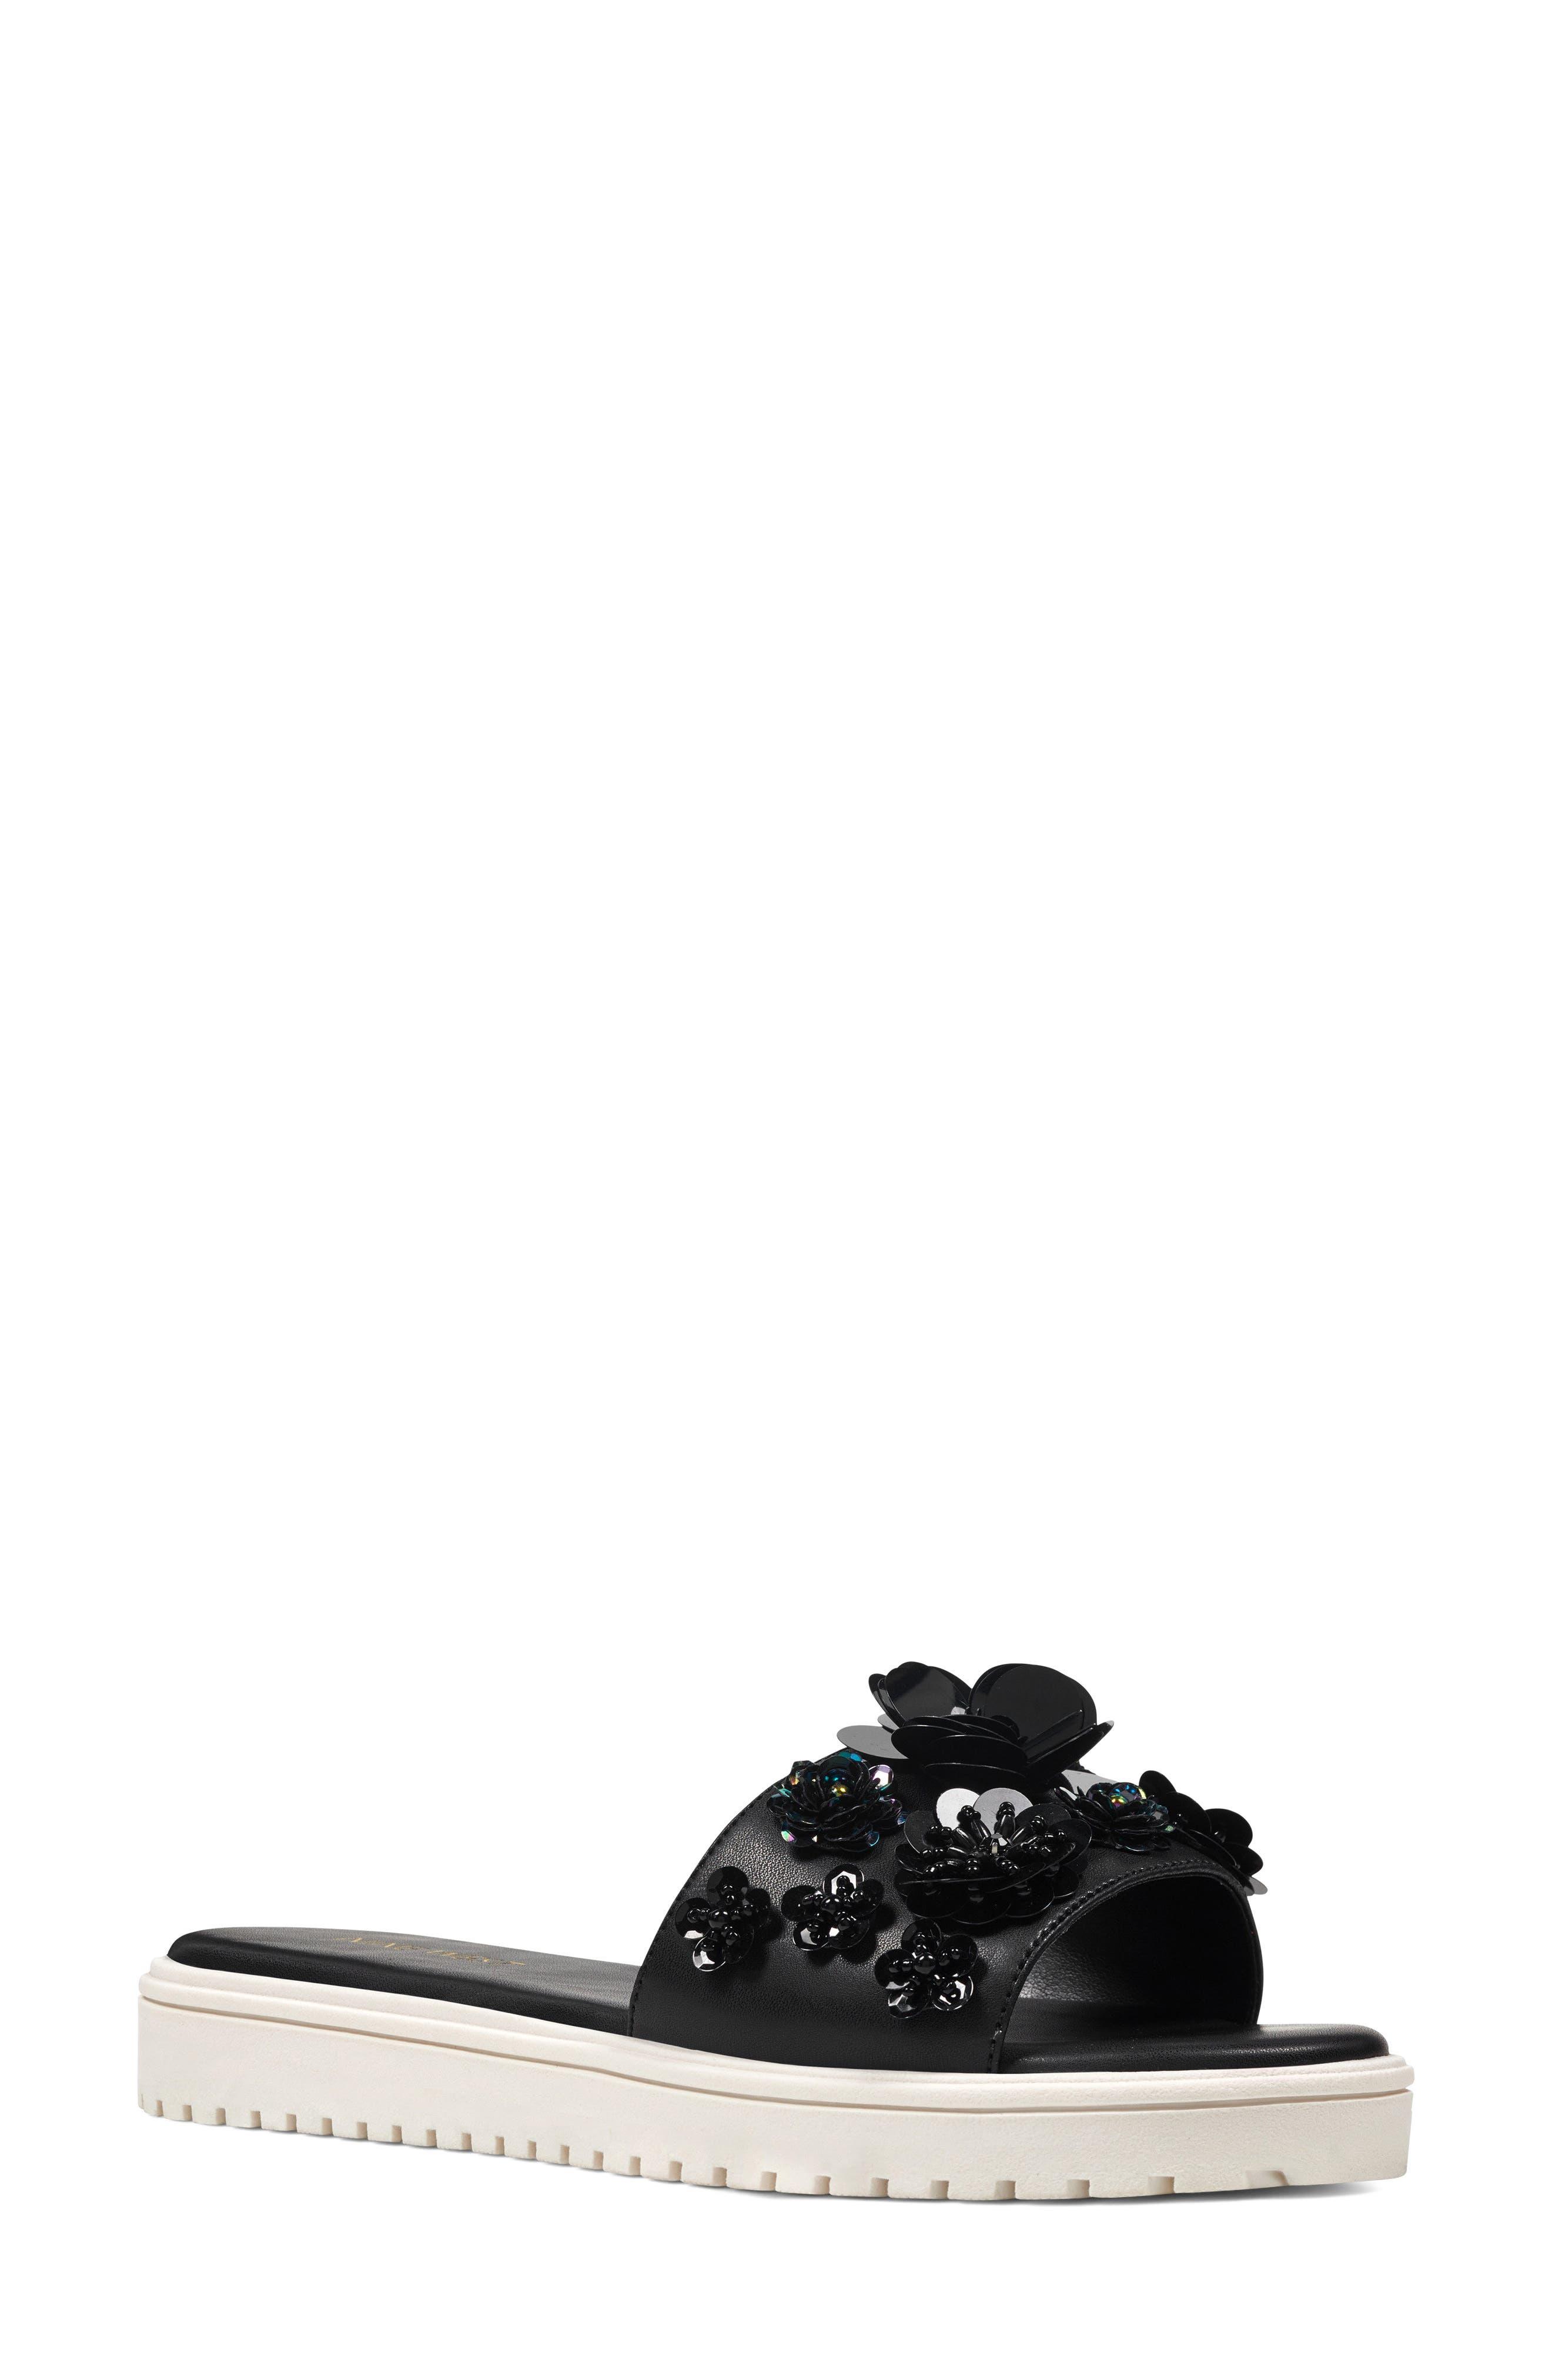 Rainen Flower Embellished Slide Sandal,                             Main thumbnail 1, color,                             Black Fabric